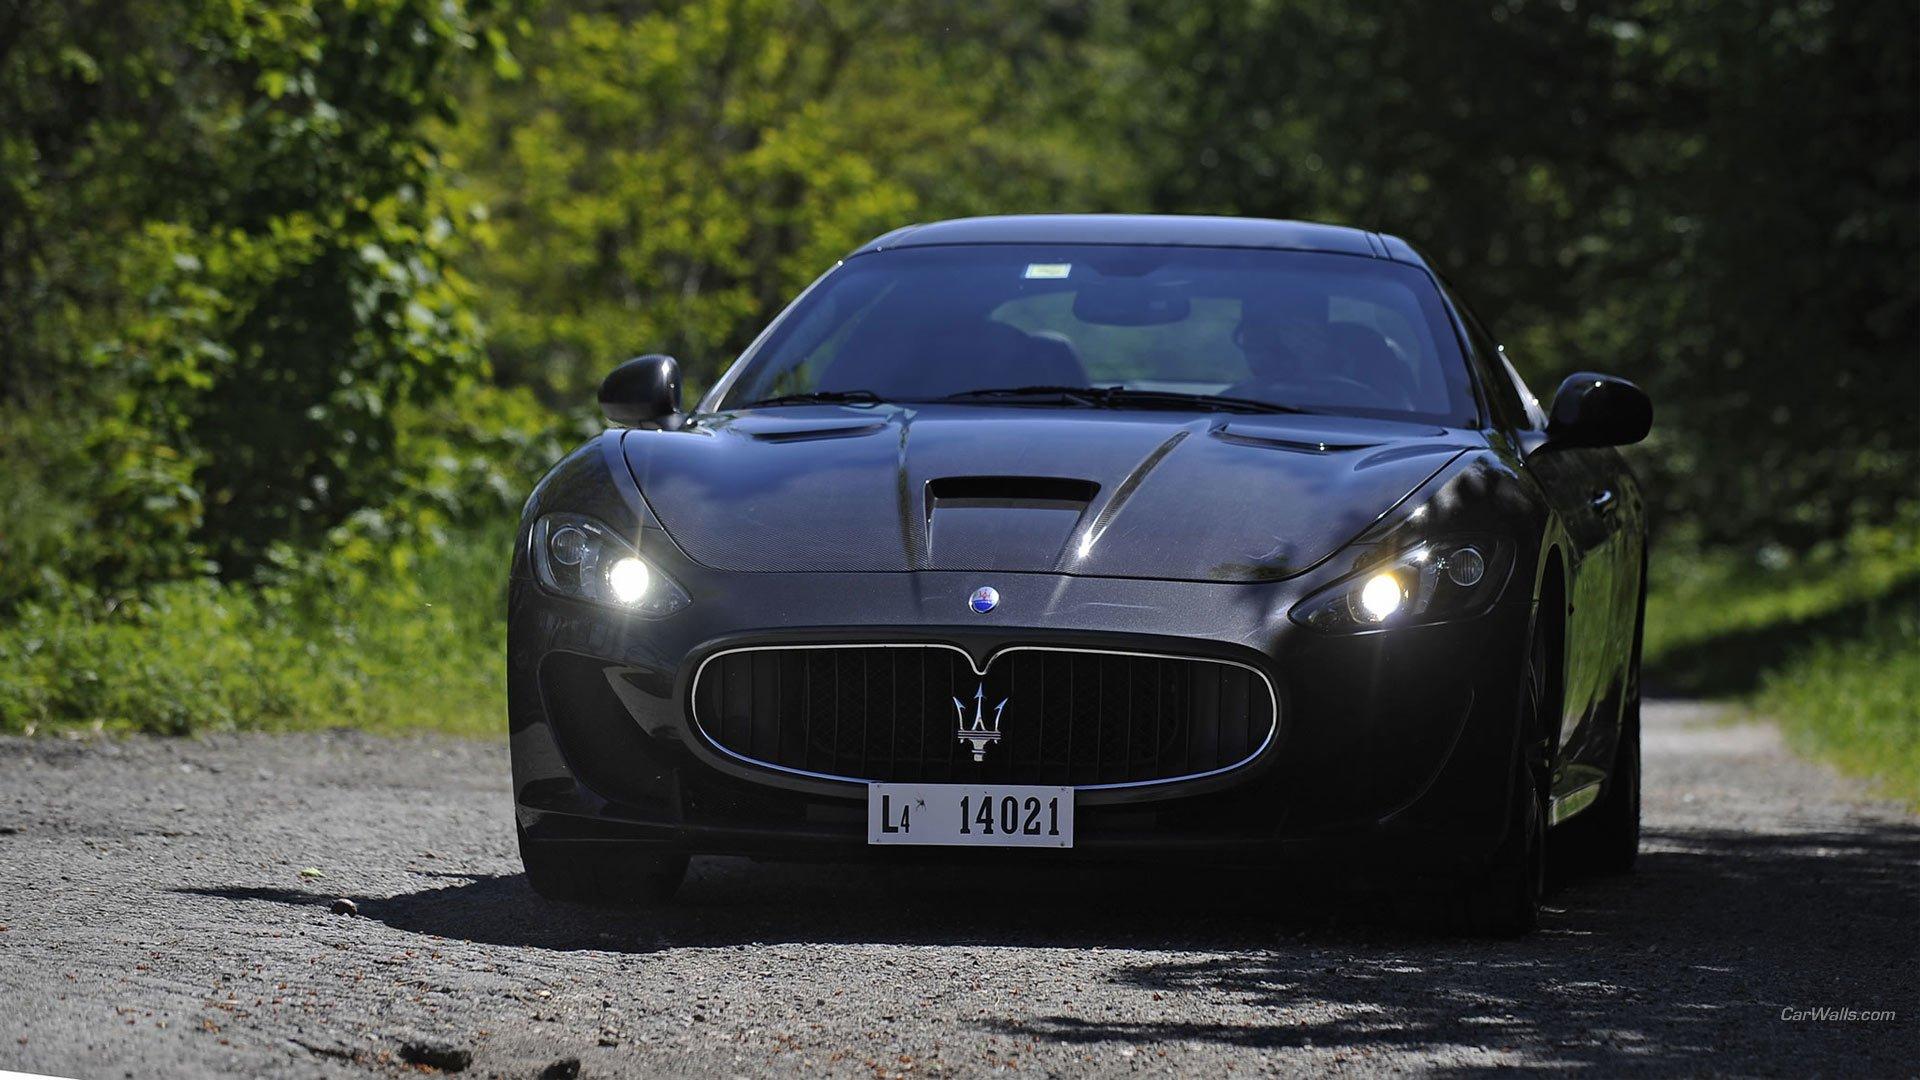 2014 Maserati GranTurismo MC Stradale High Quality Background on Wallpapers Vista